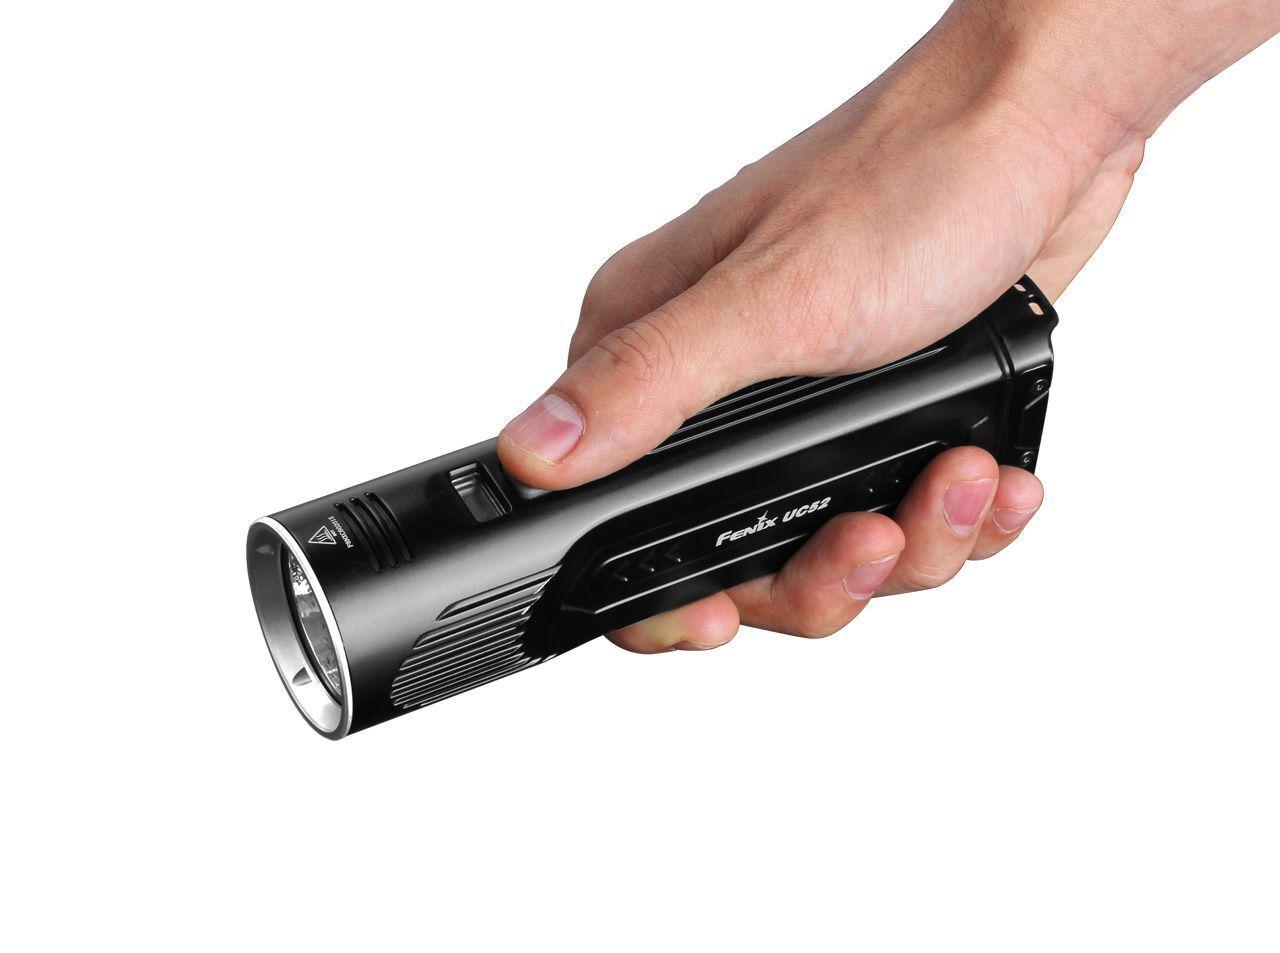 Fenix uc52 2018 3100lm ip68 42mm oled display holster cargador USB-carga